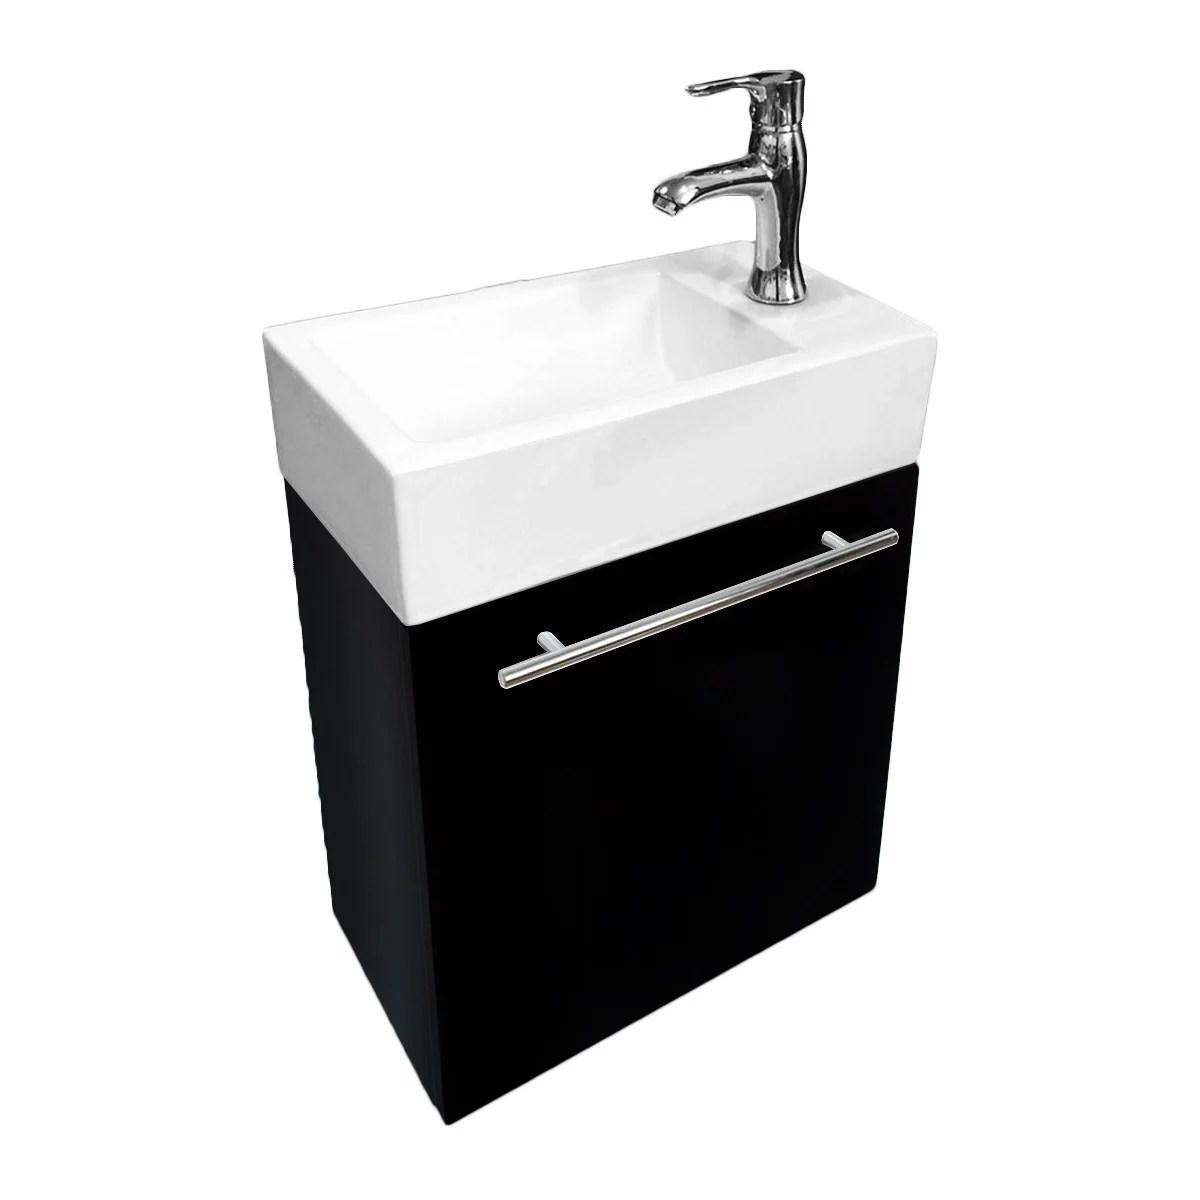 Renovators Supply Small Wall Mount Bathroom Vanity